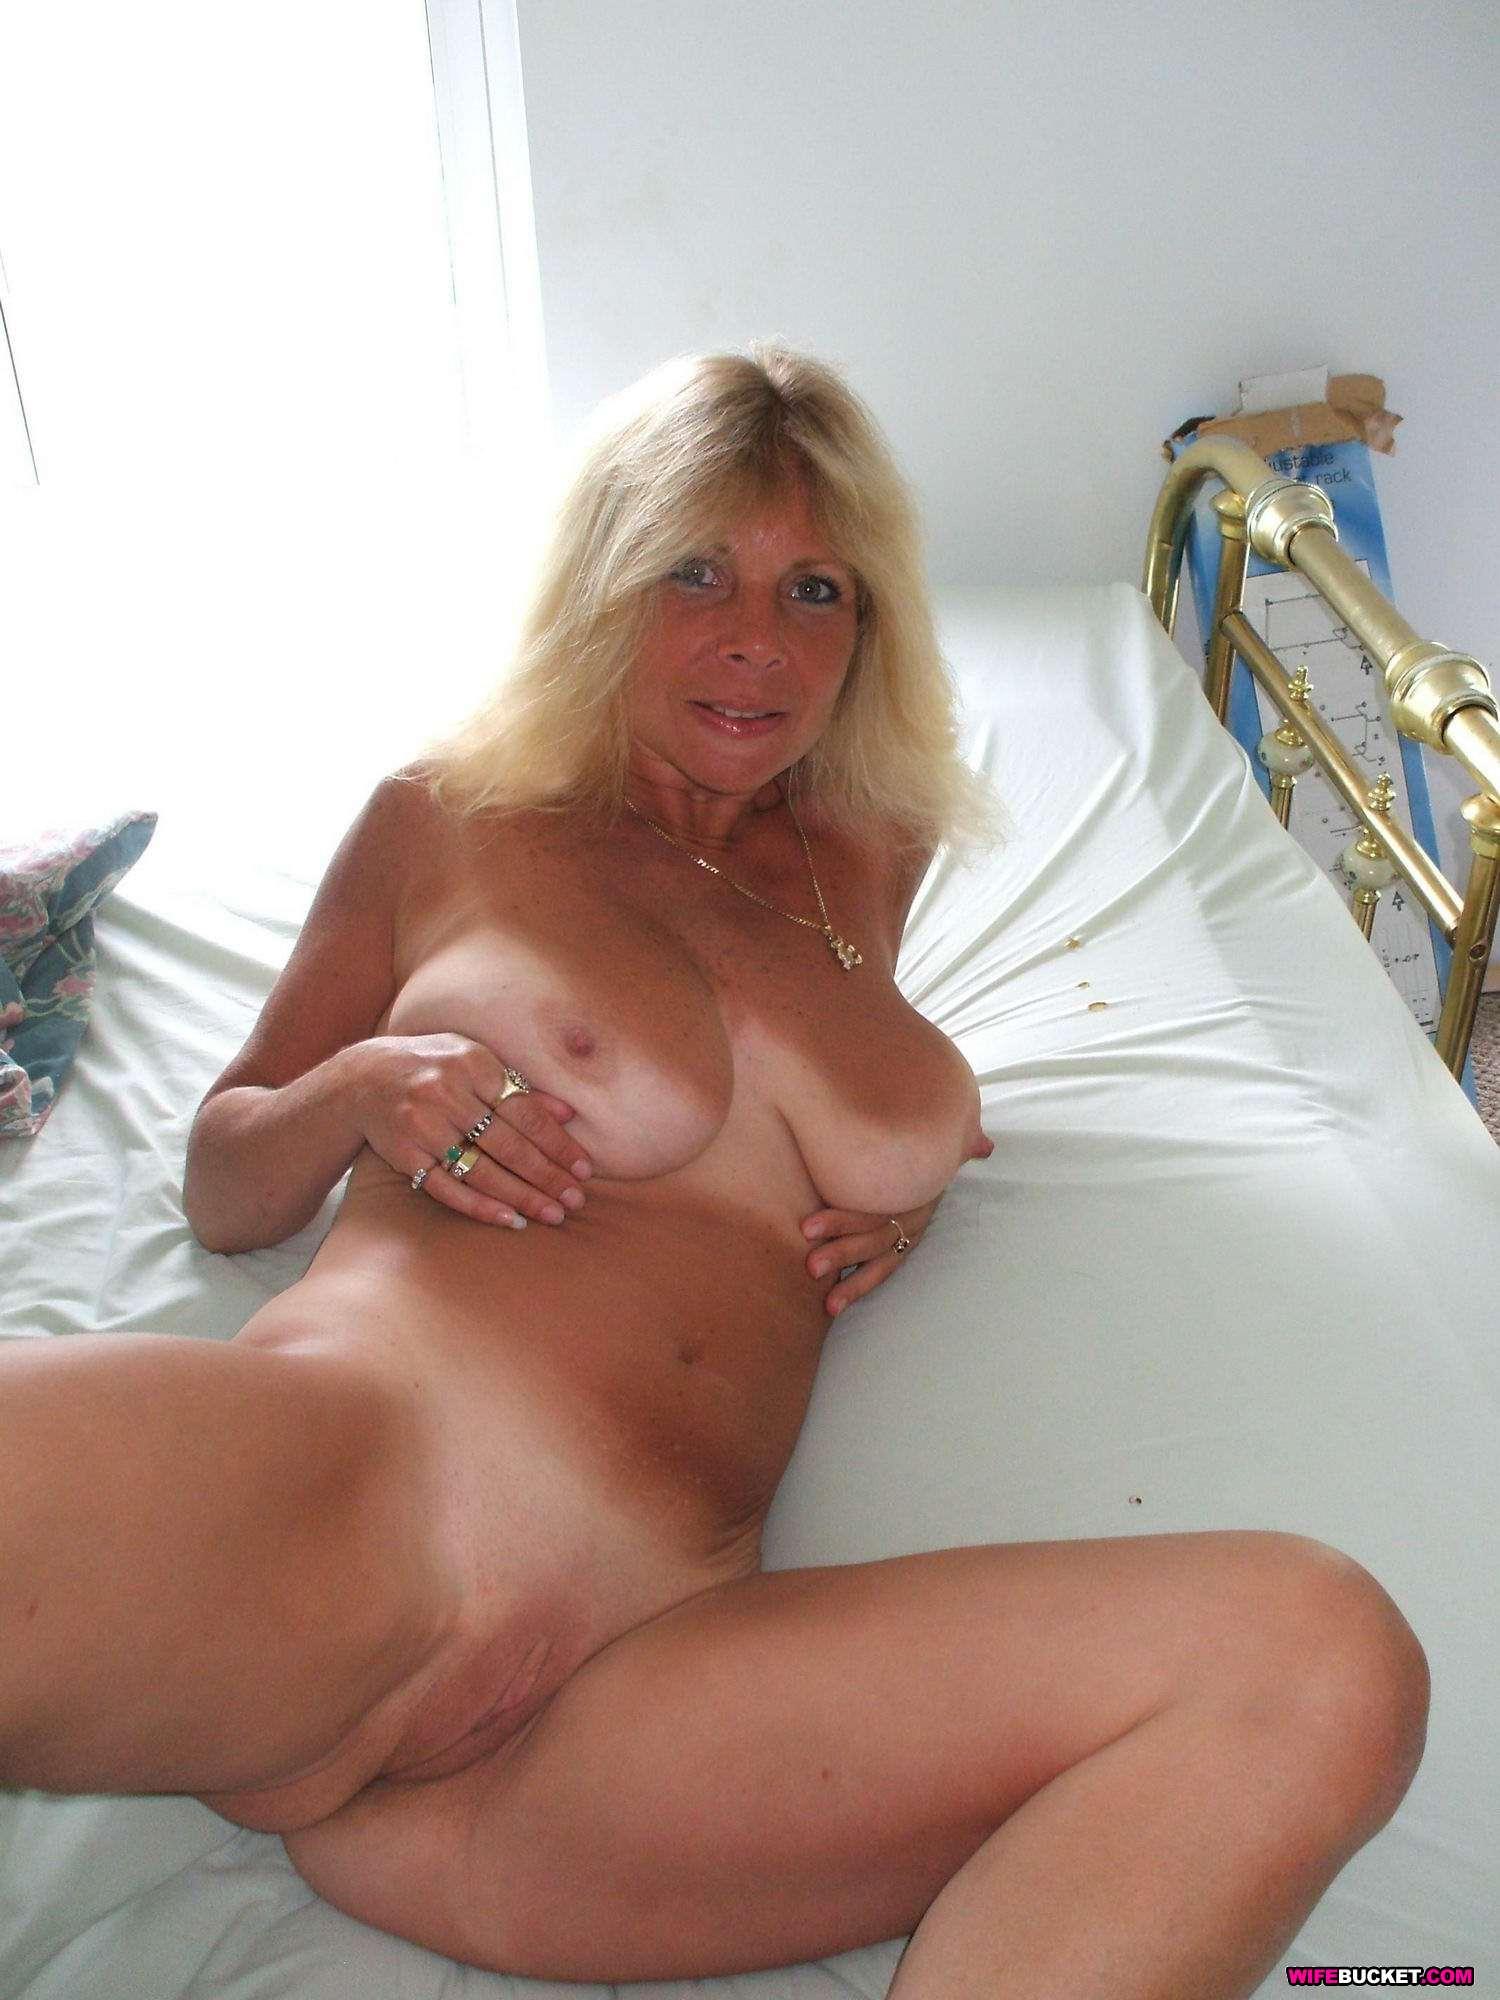 wife naked photos free